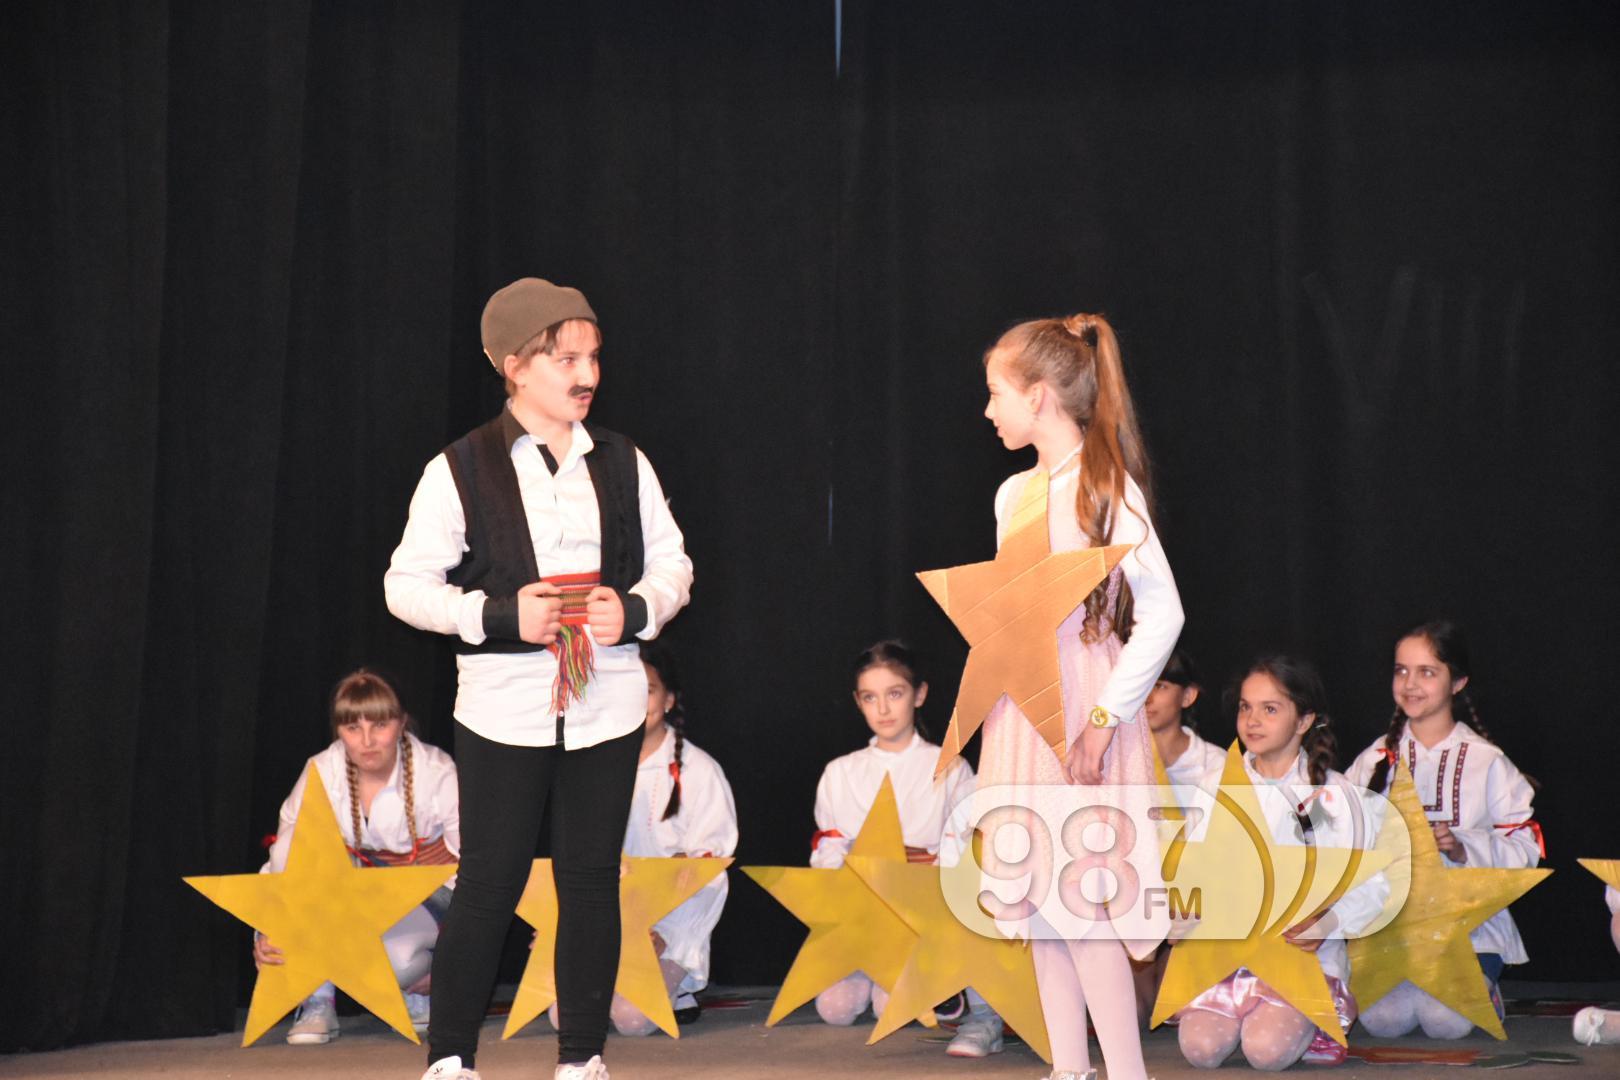 OPŠTINSKA DRAMSKA SMOTRA, 2017, SVILOJEVO